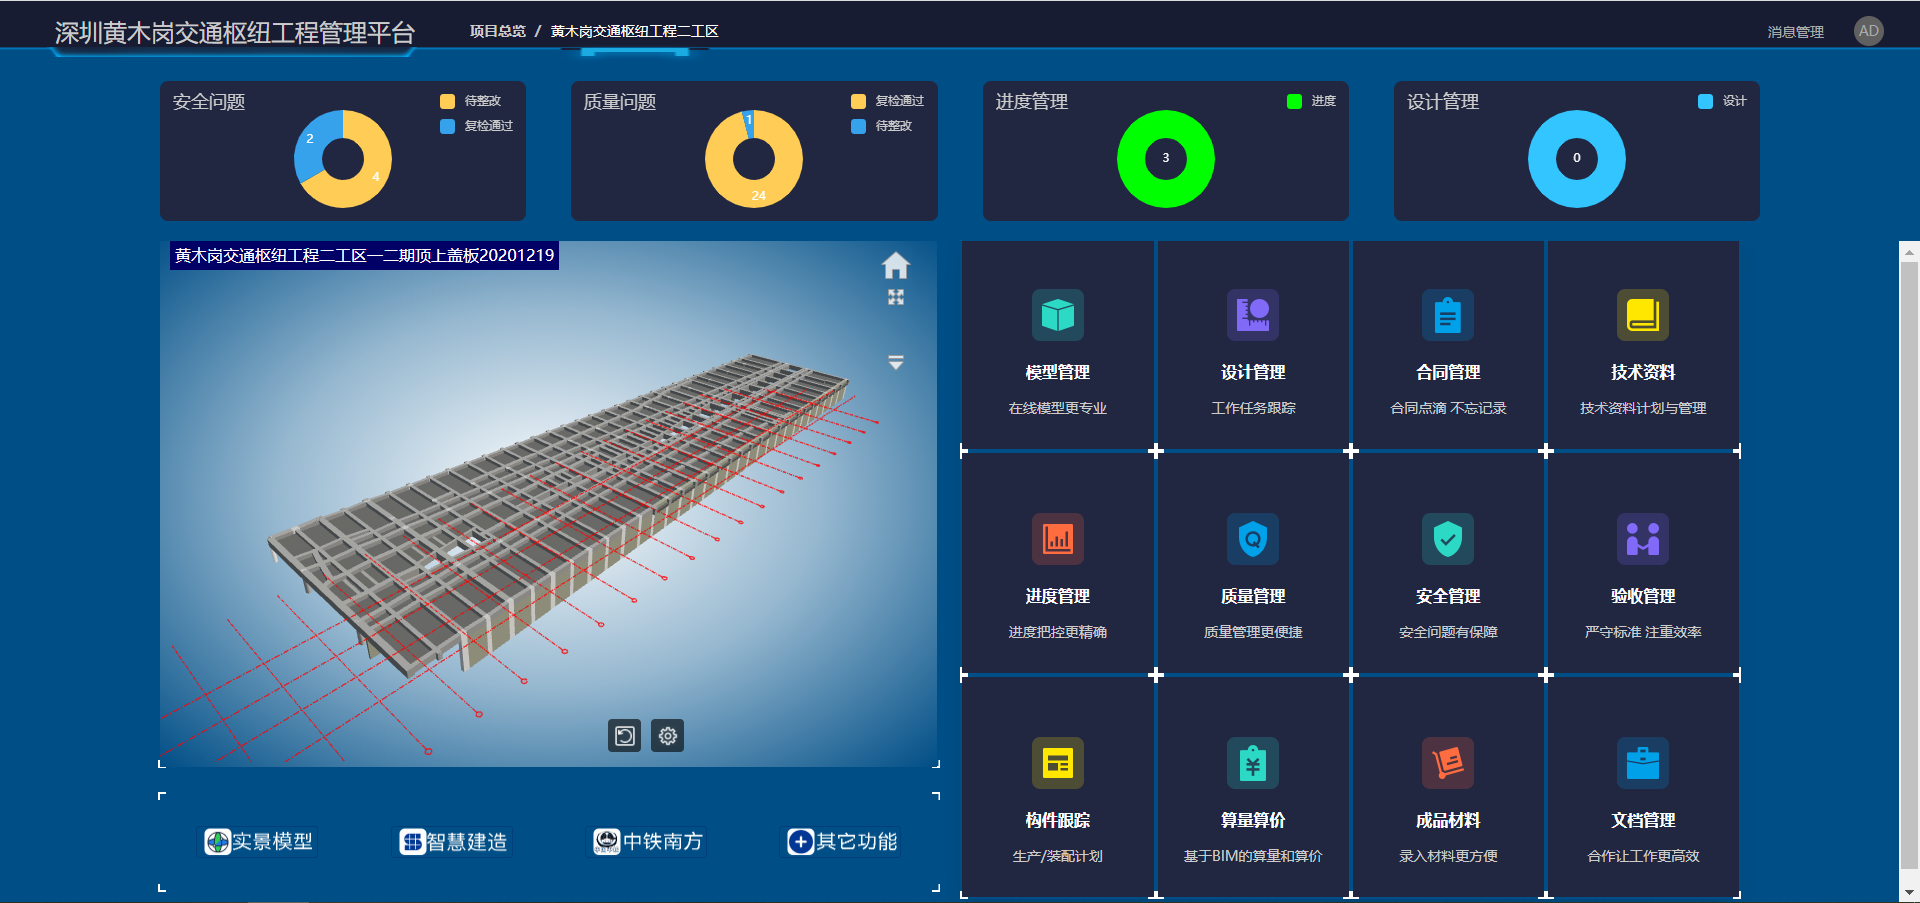 EPC总承包项目管理平台